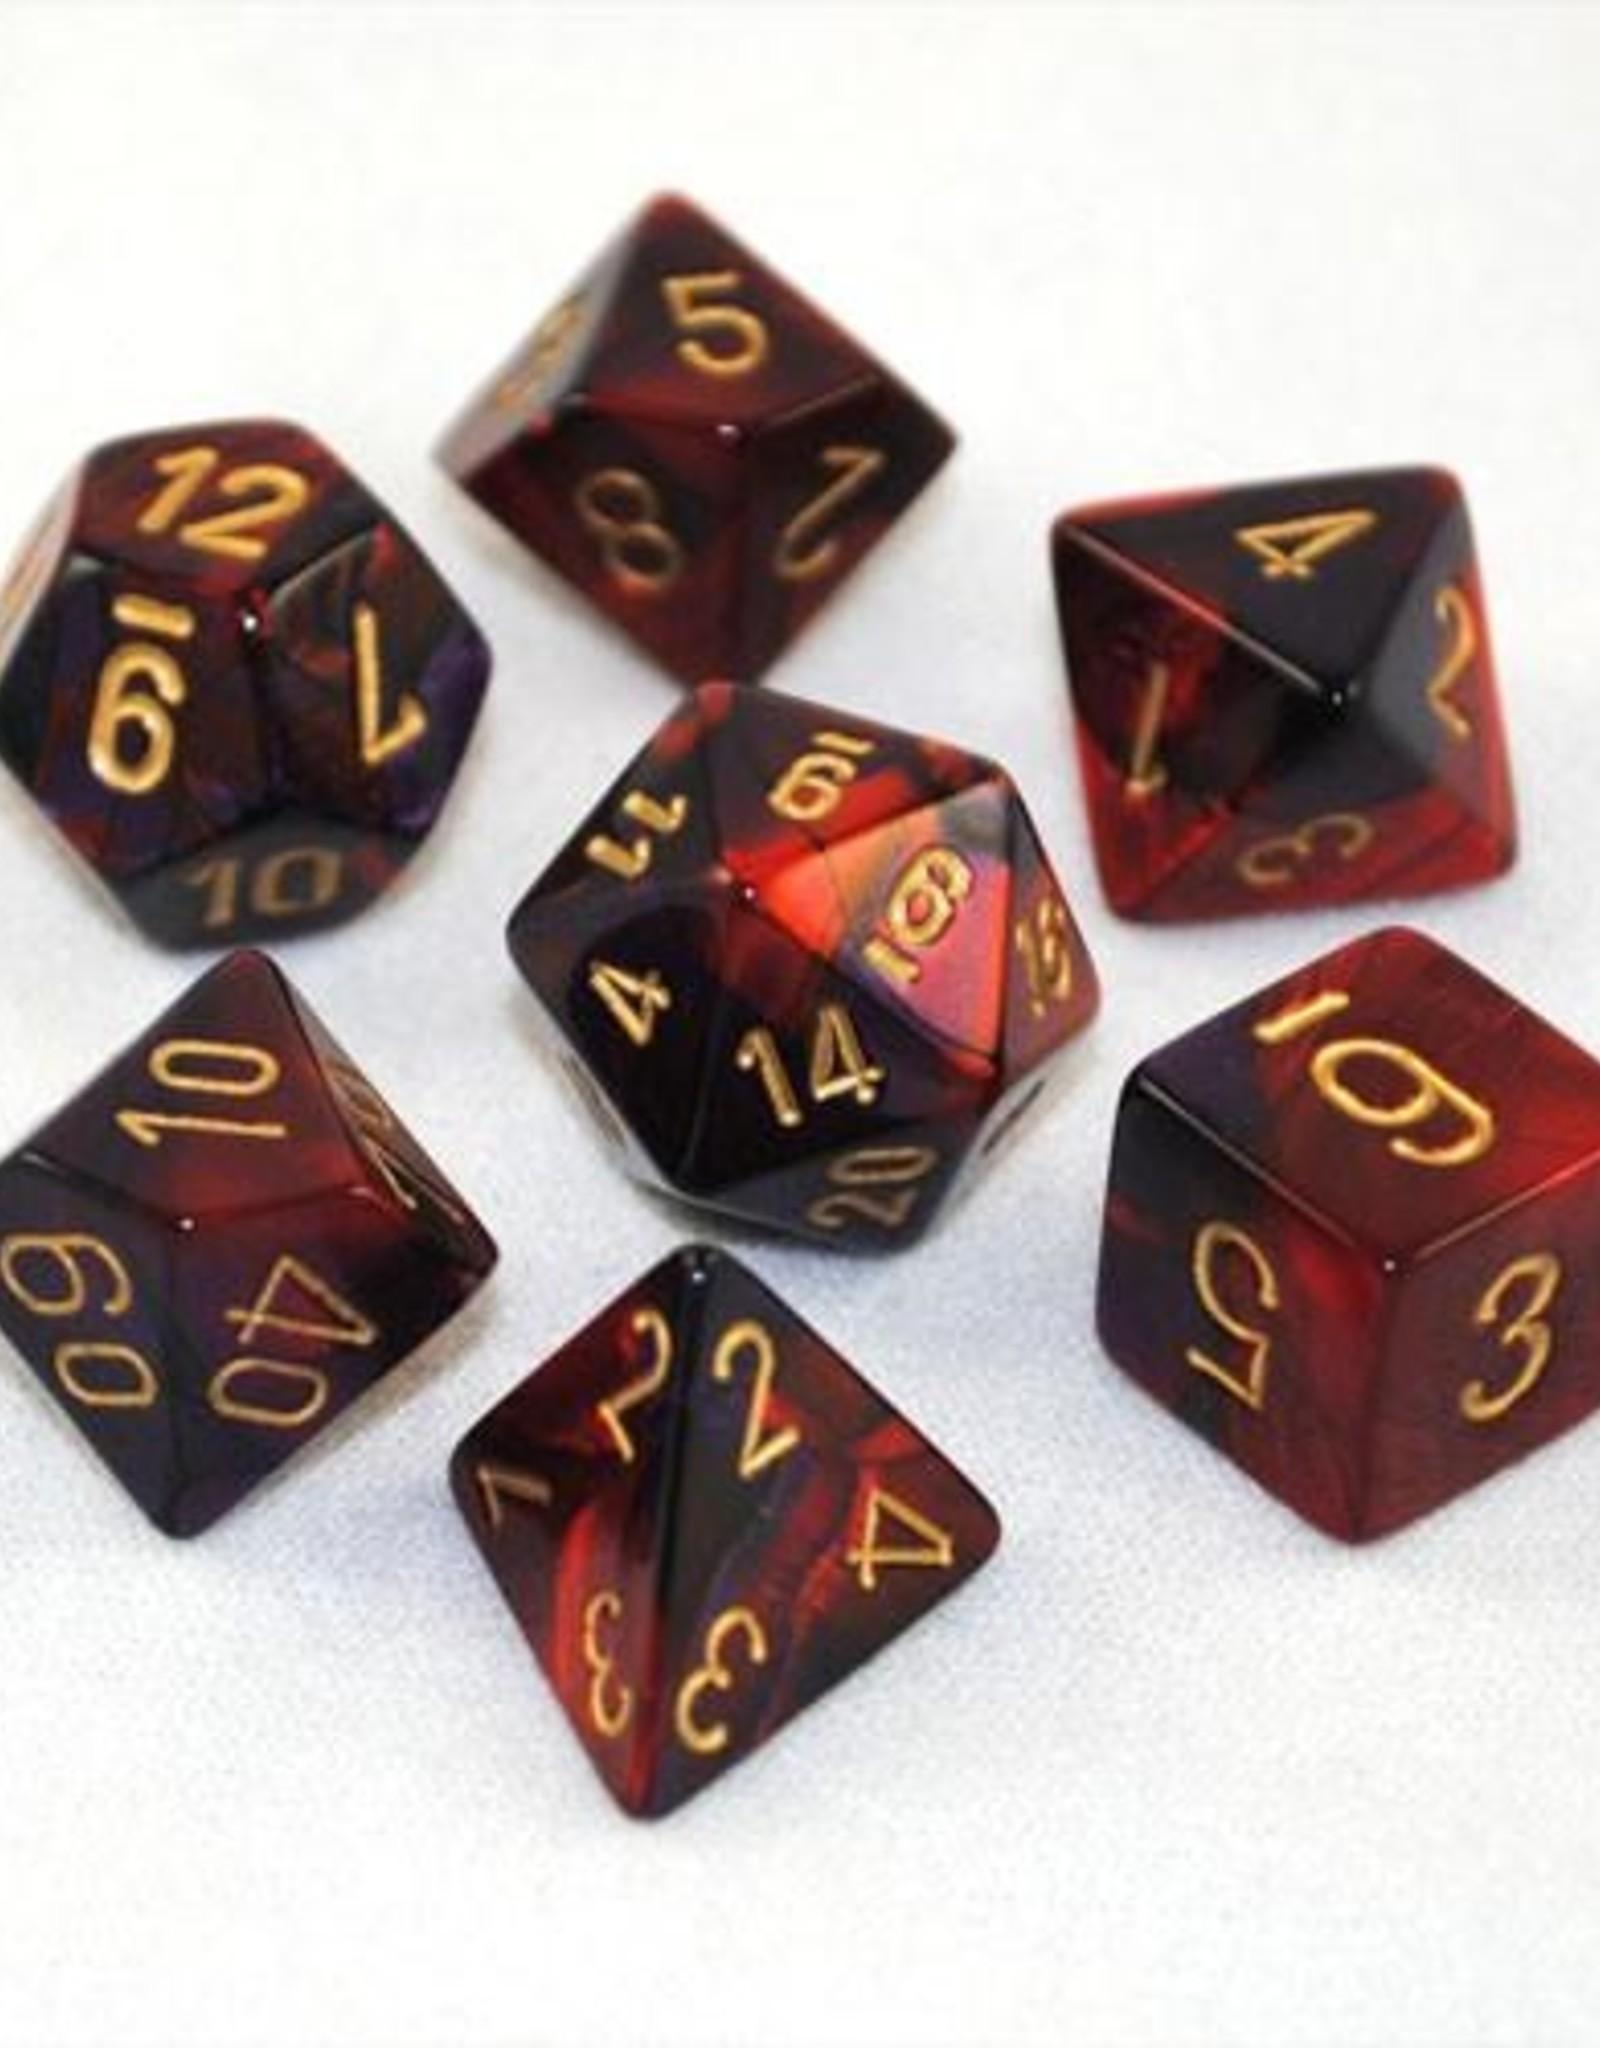 Chessex Chessex 7-Die set Gemini - Black-Red/Gold